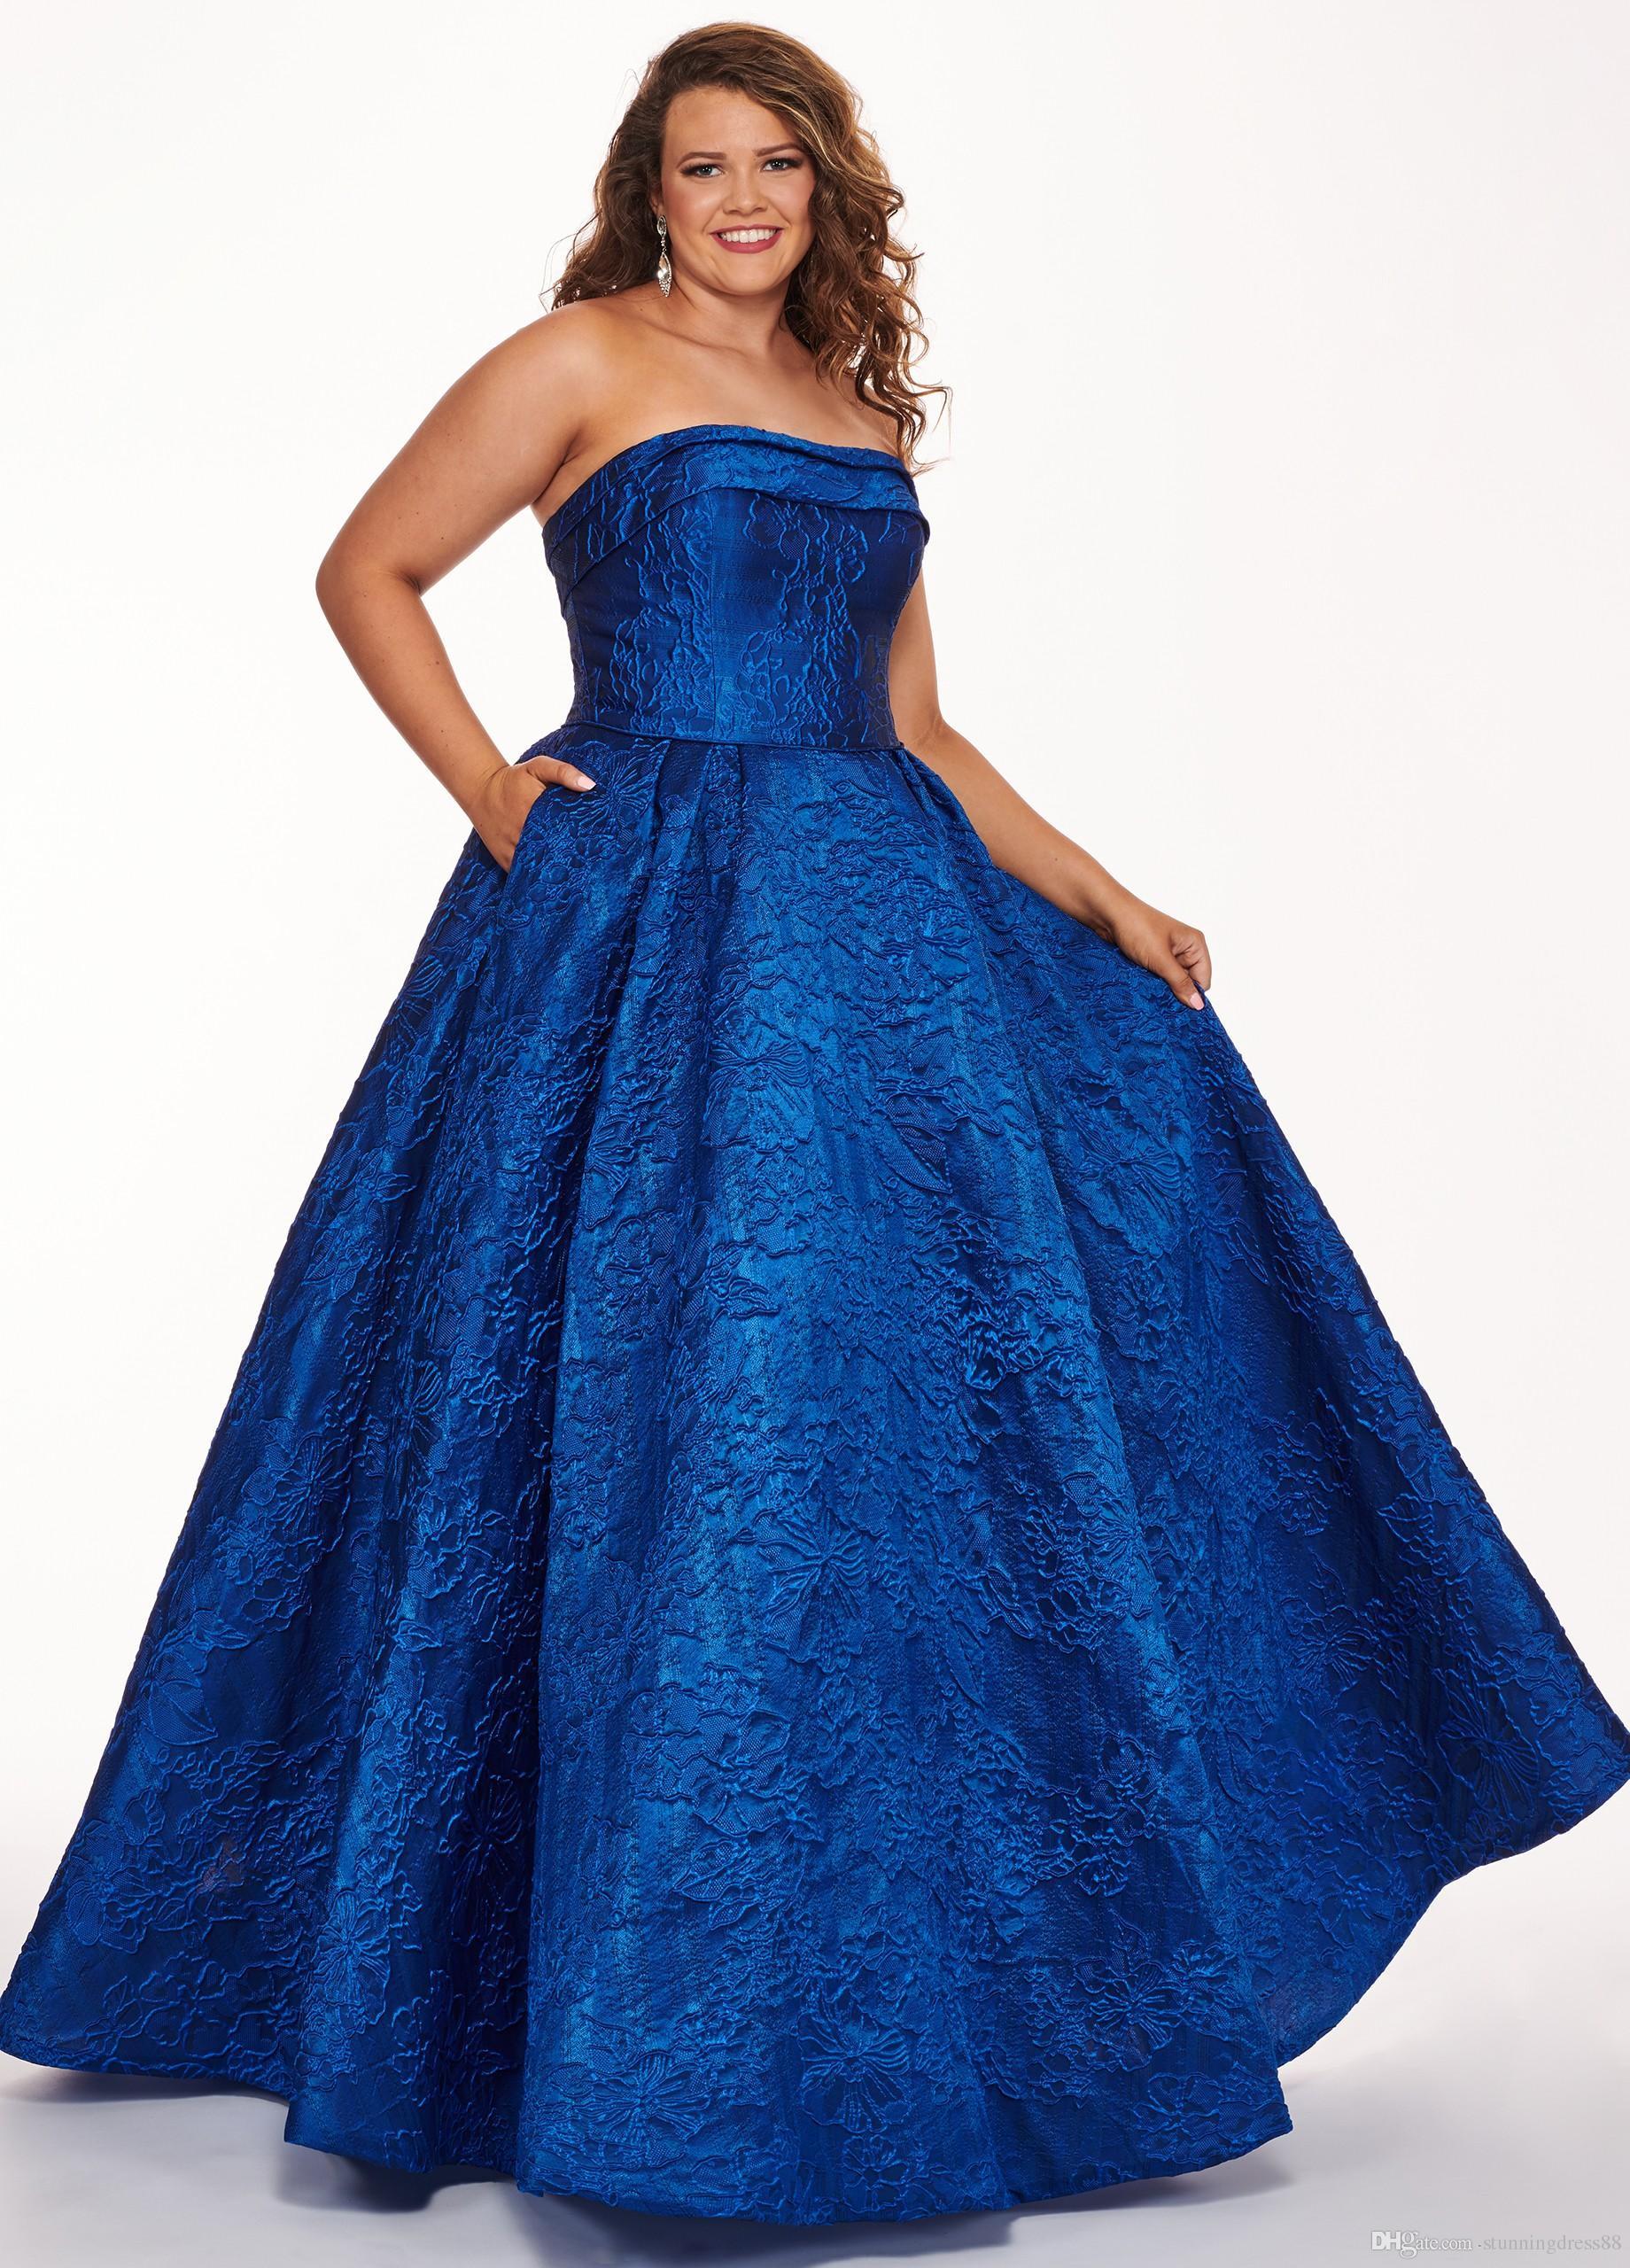 15 Kreativ Abendkleid Plus Size Stylish Großartig Abendkleid Plus Size Stylish